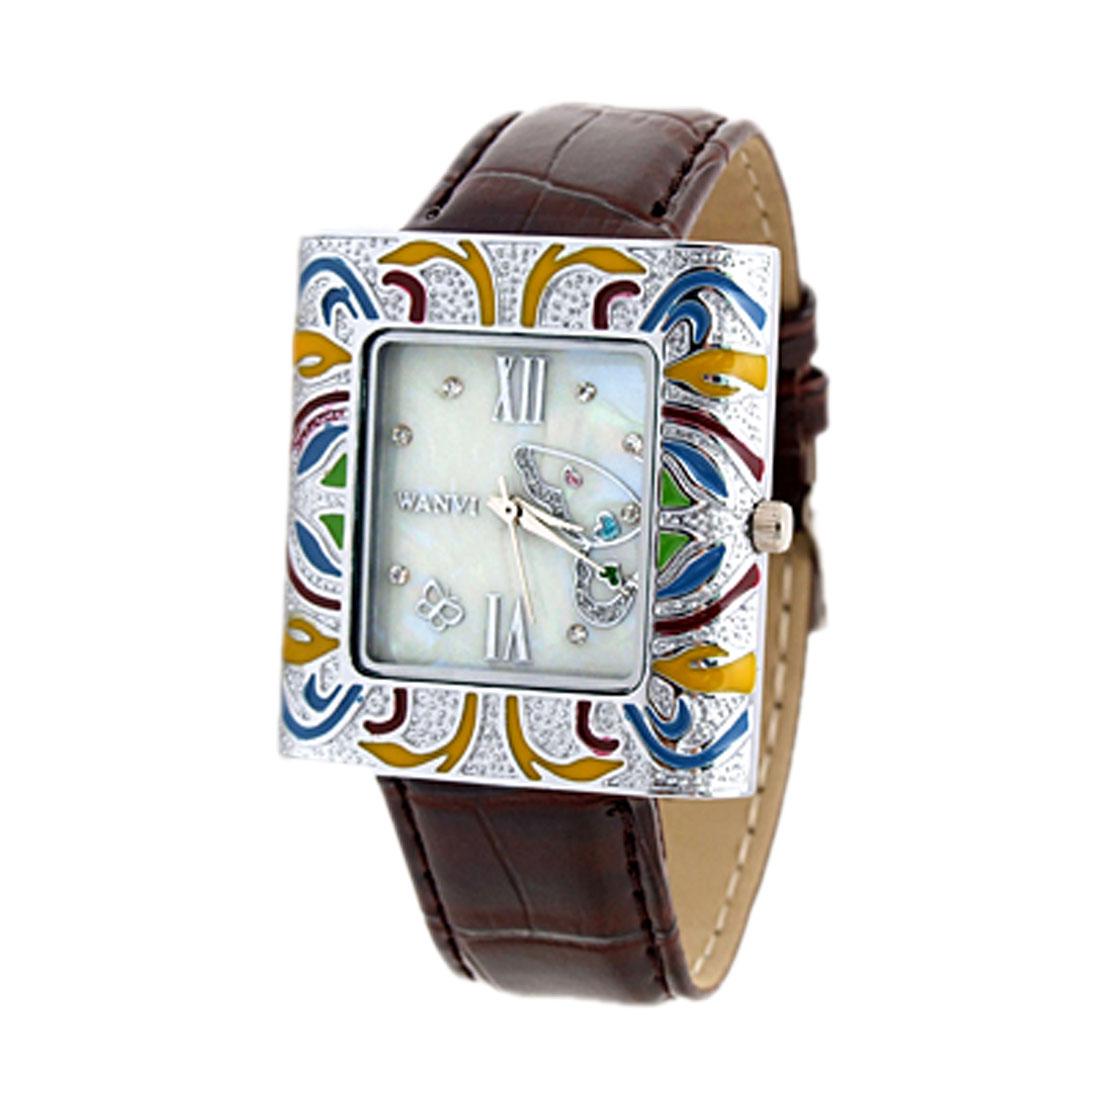 Ladies' Brown Leather Man-made Cloisonne Art Quartz Wrist Watch